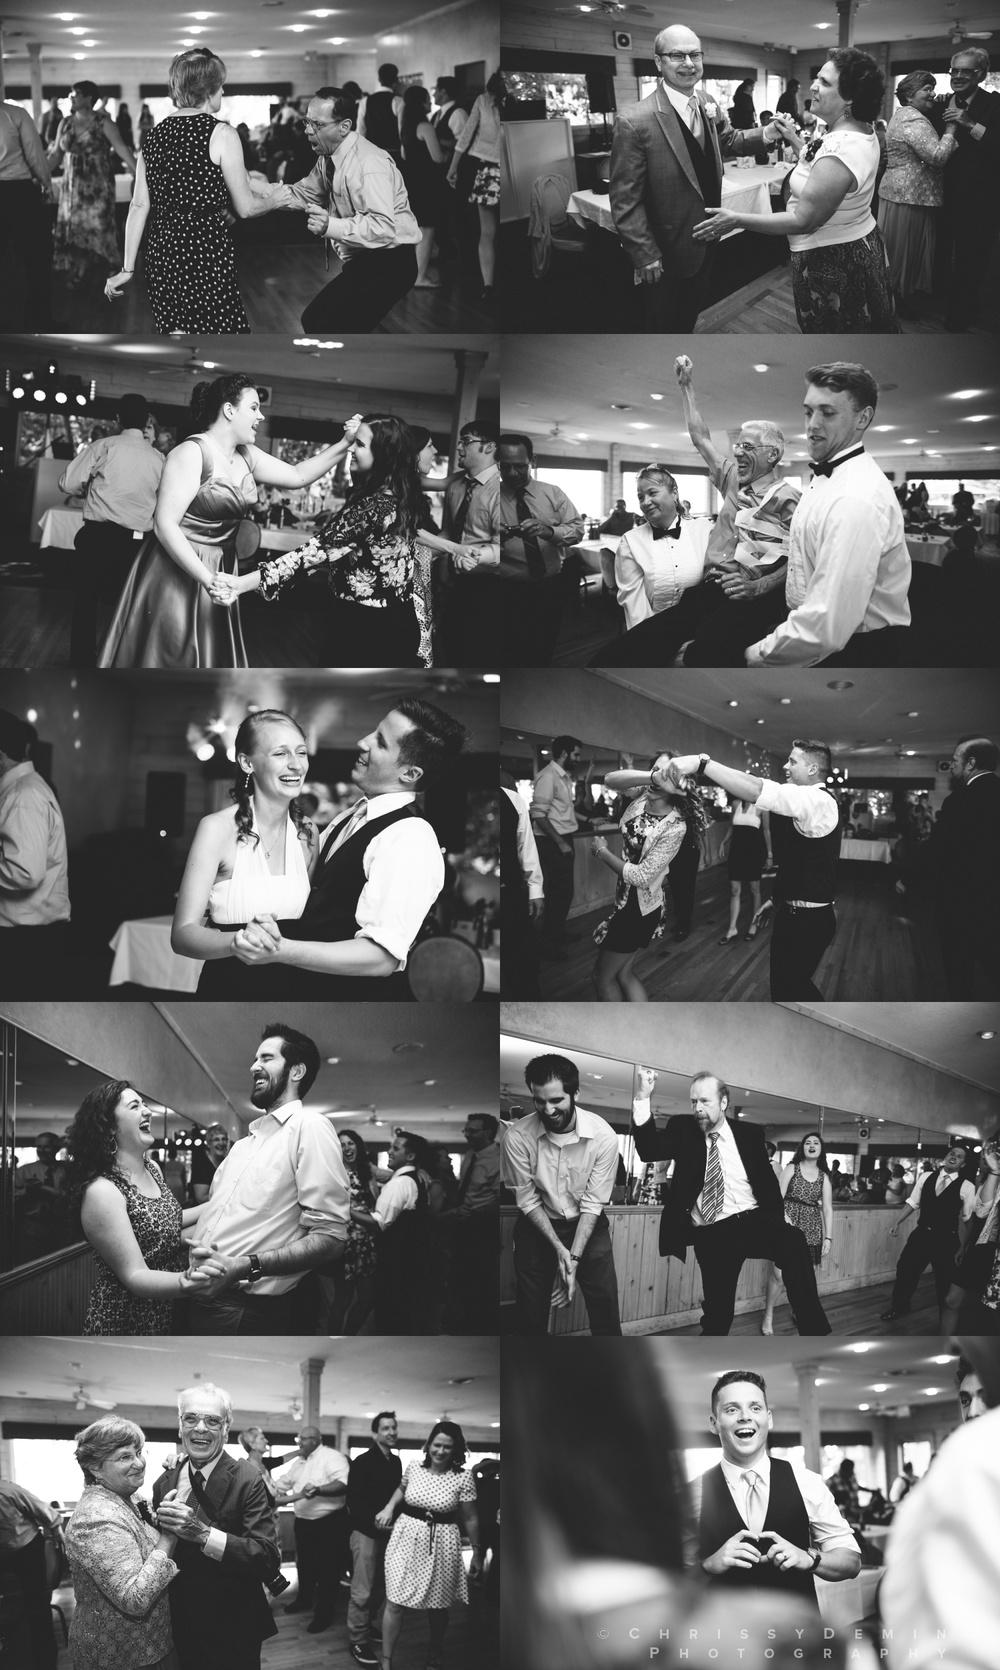 oregon_wedding_photographer_0002.jpg